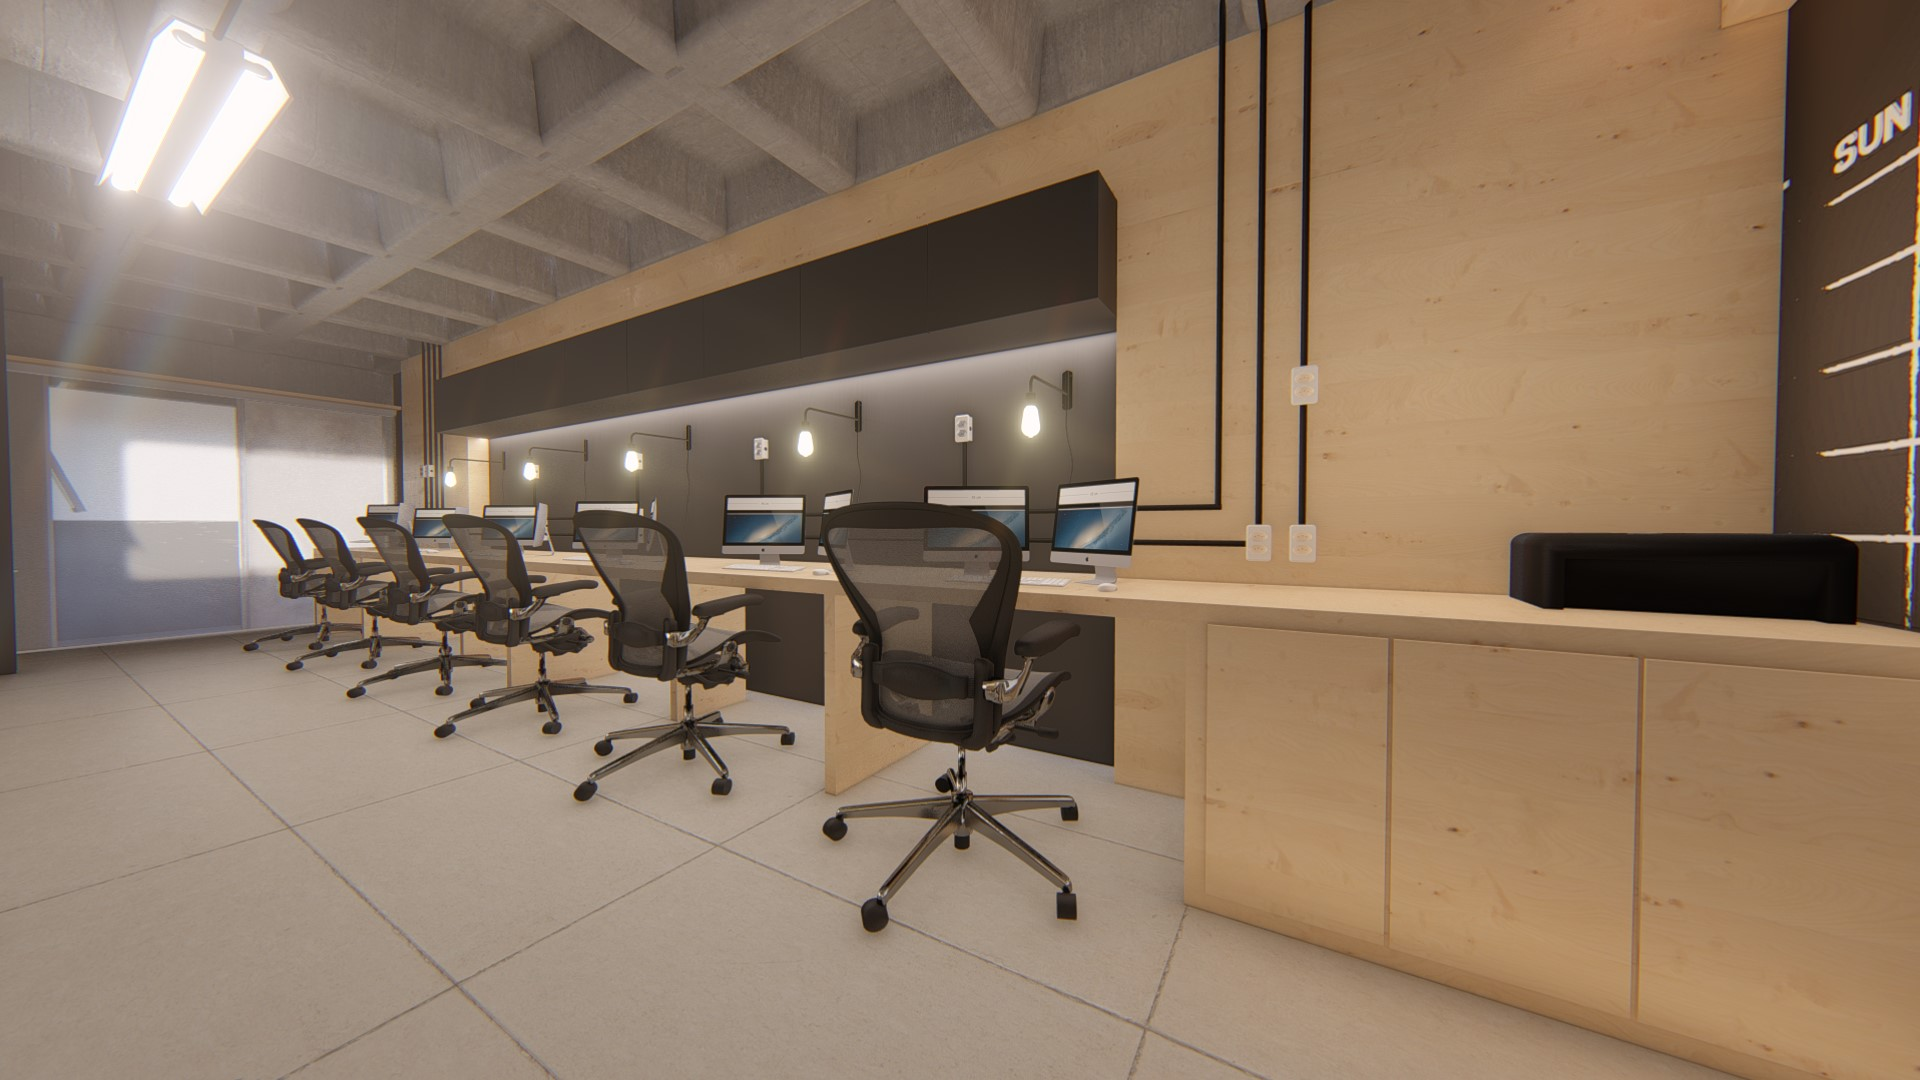 projeto-arquitetonico-cajueiro-duo-arquitetura-022.jpg